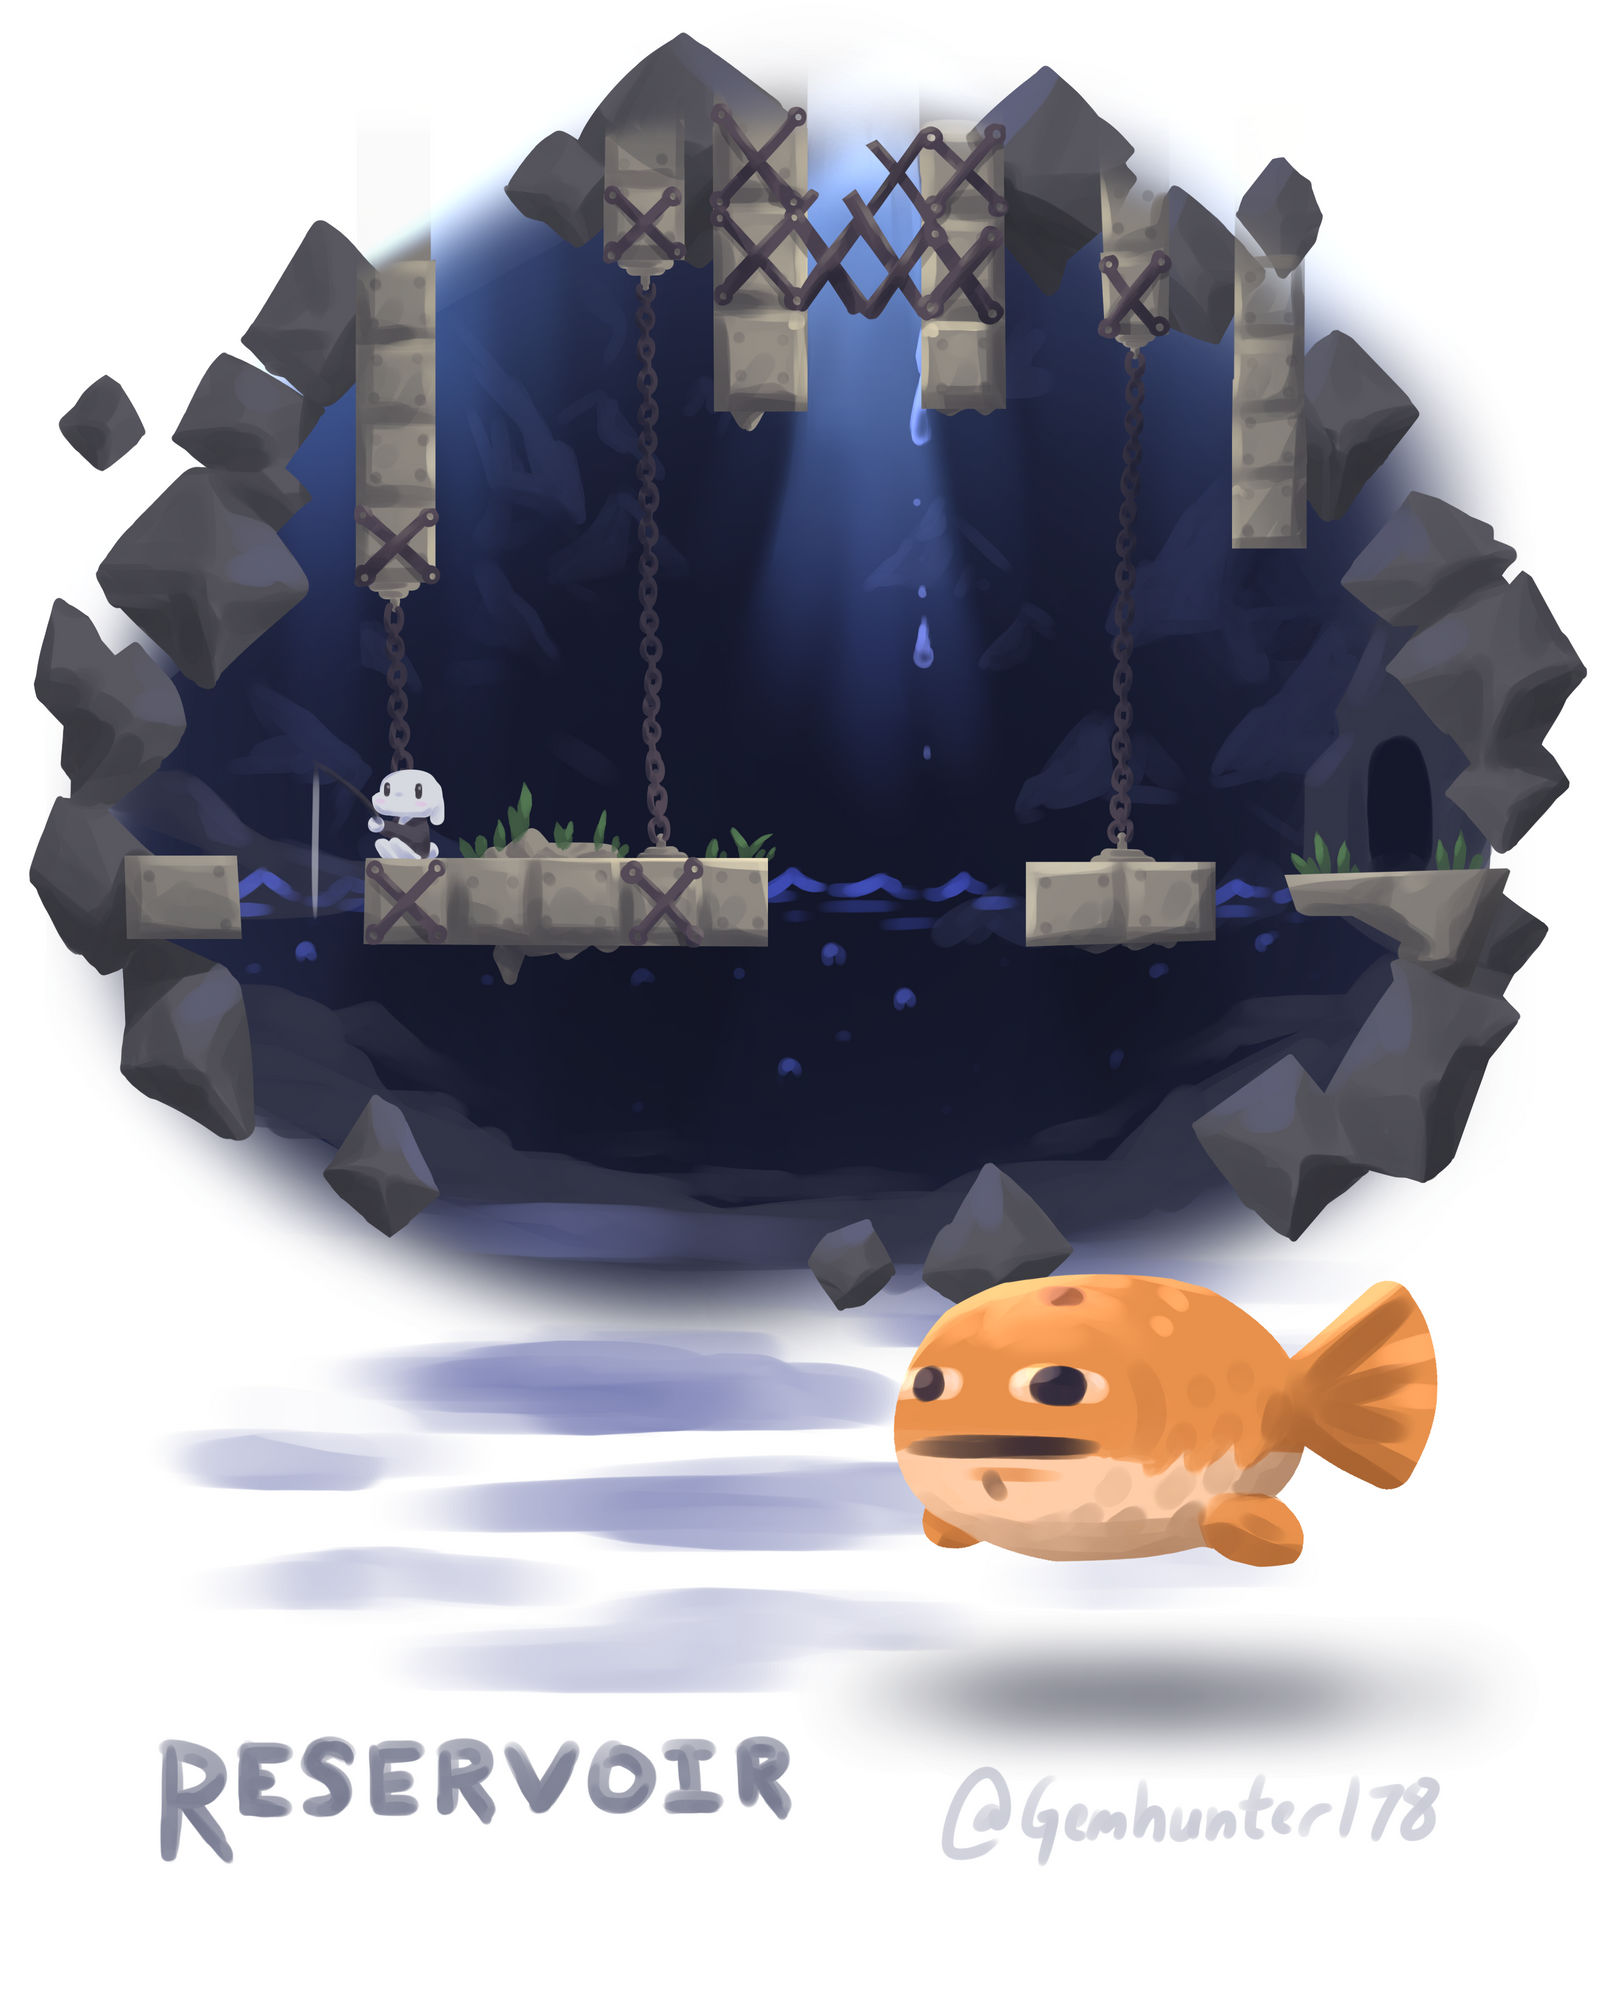 Cave Story - Reservoir